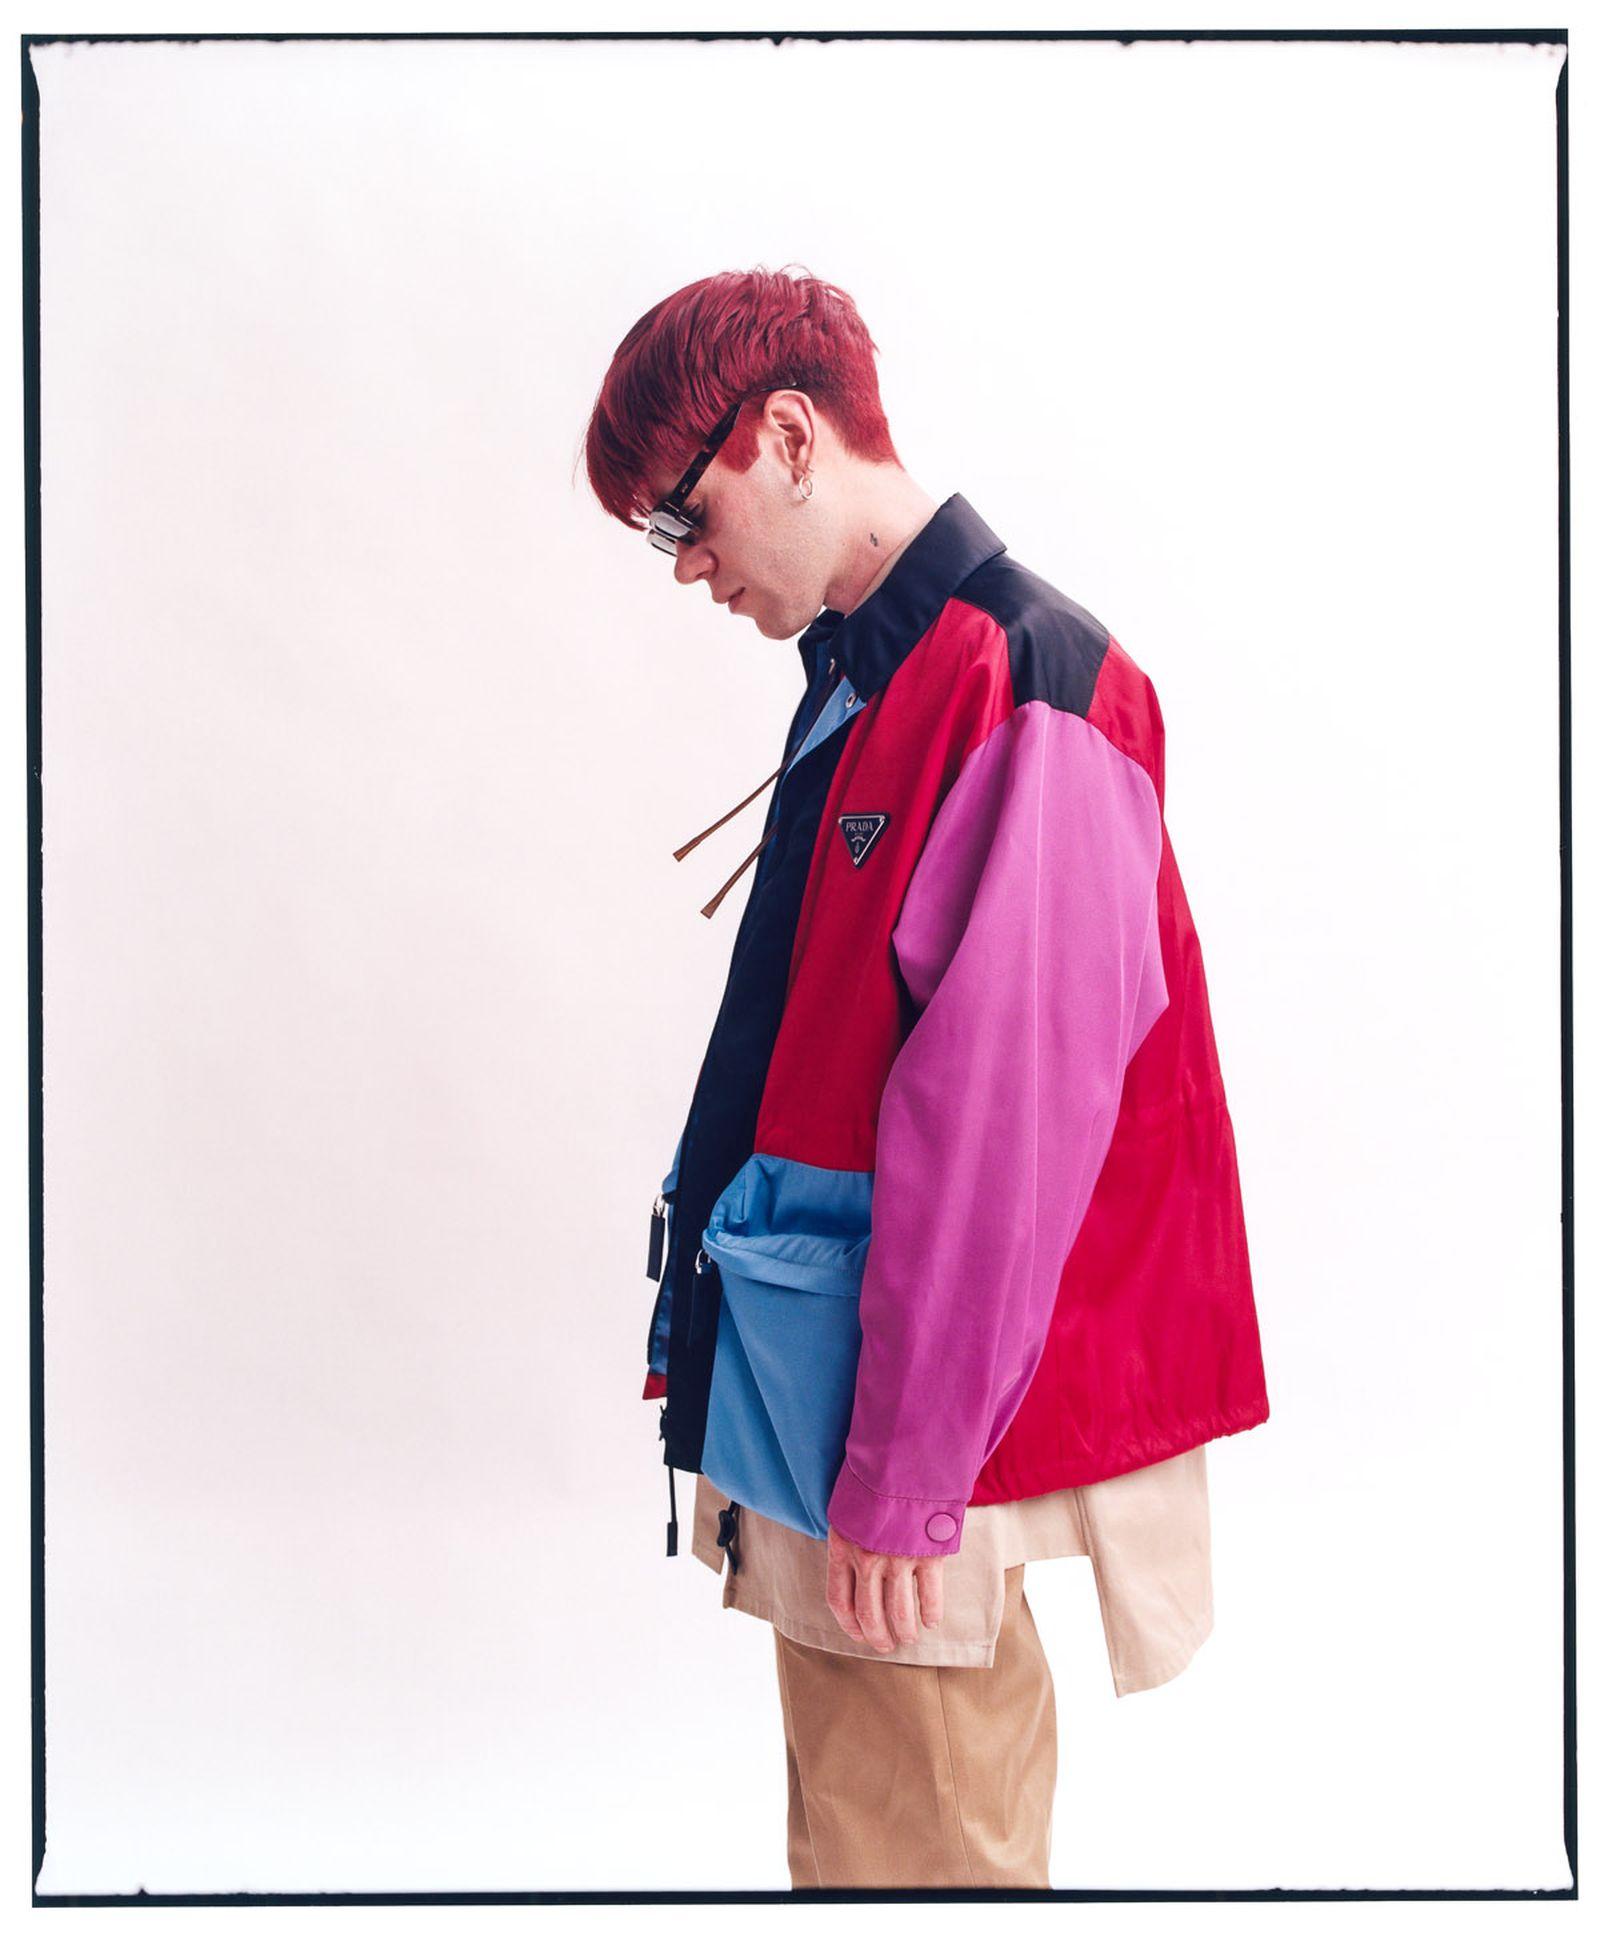 All Clothing by Prada